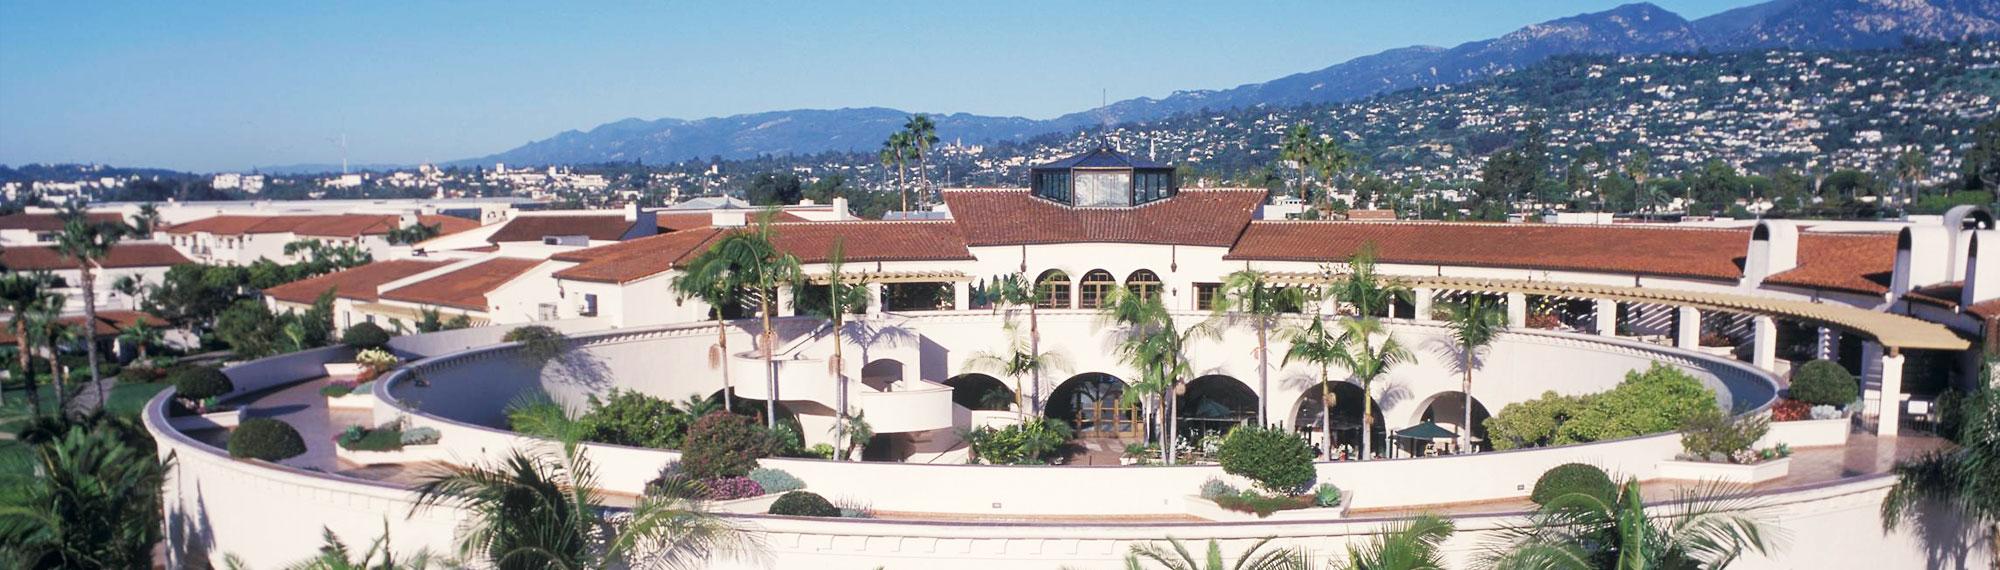 2016 Santa Barbara Business Expo